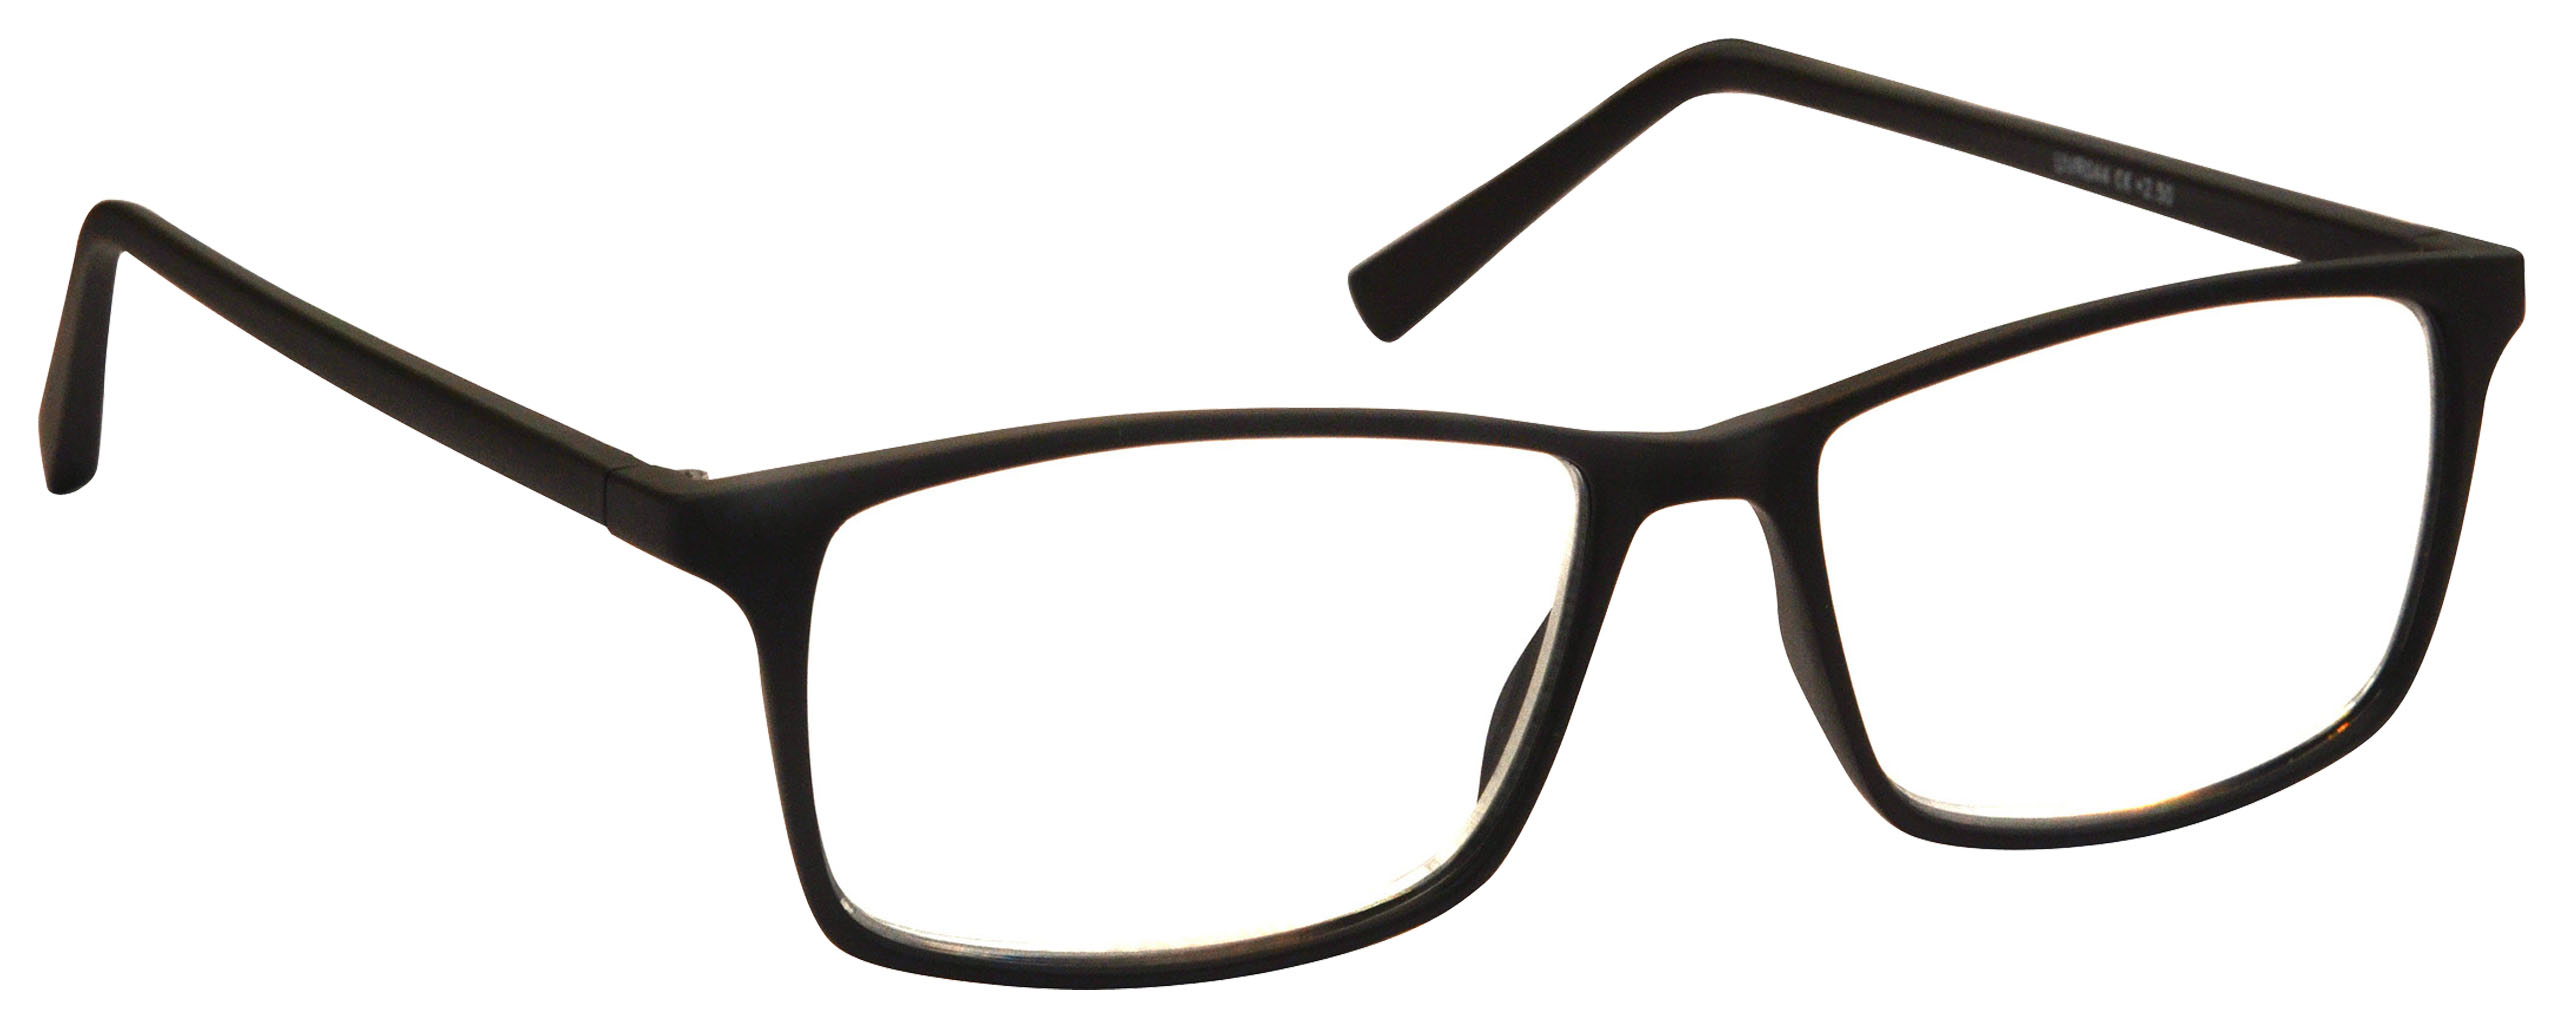 UV Reader Eco Friendly Reading Glasses Rilsan Frames 100% Renewable ...